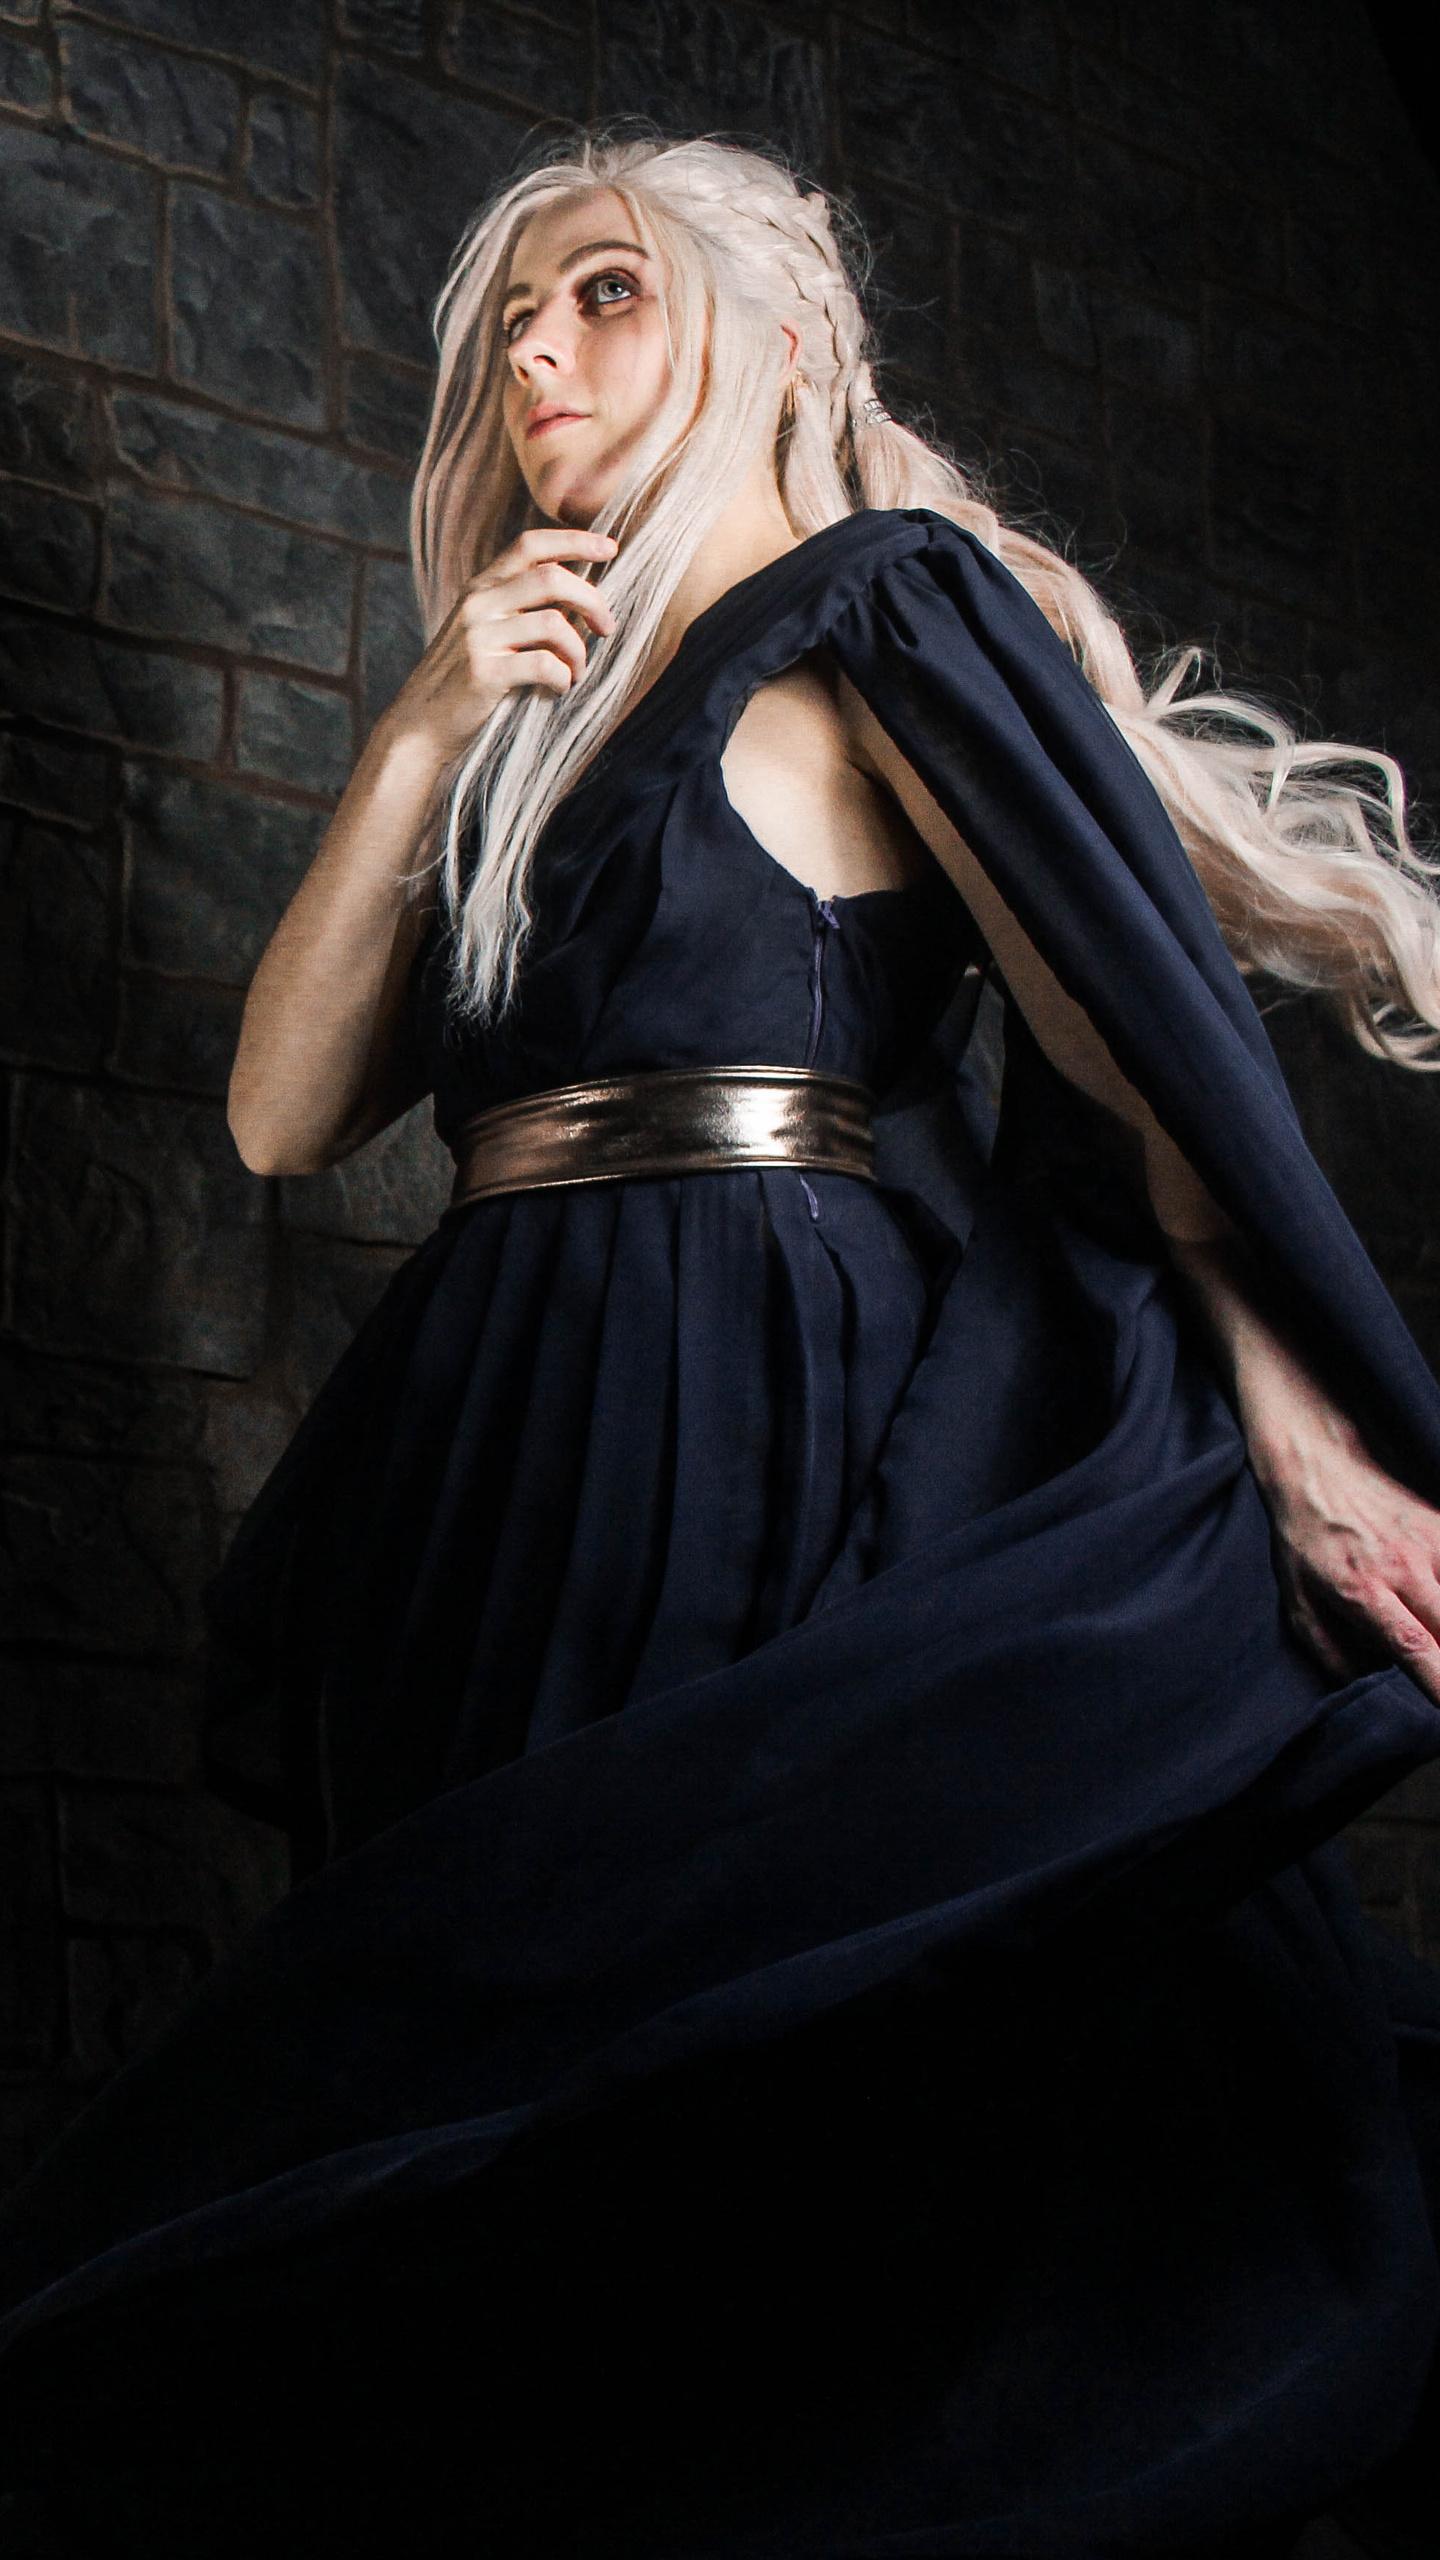 emilia-clarke-game-of-thrones-cosplay-4a.jpg